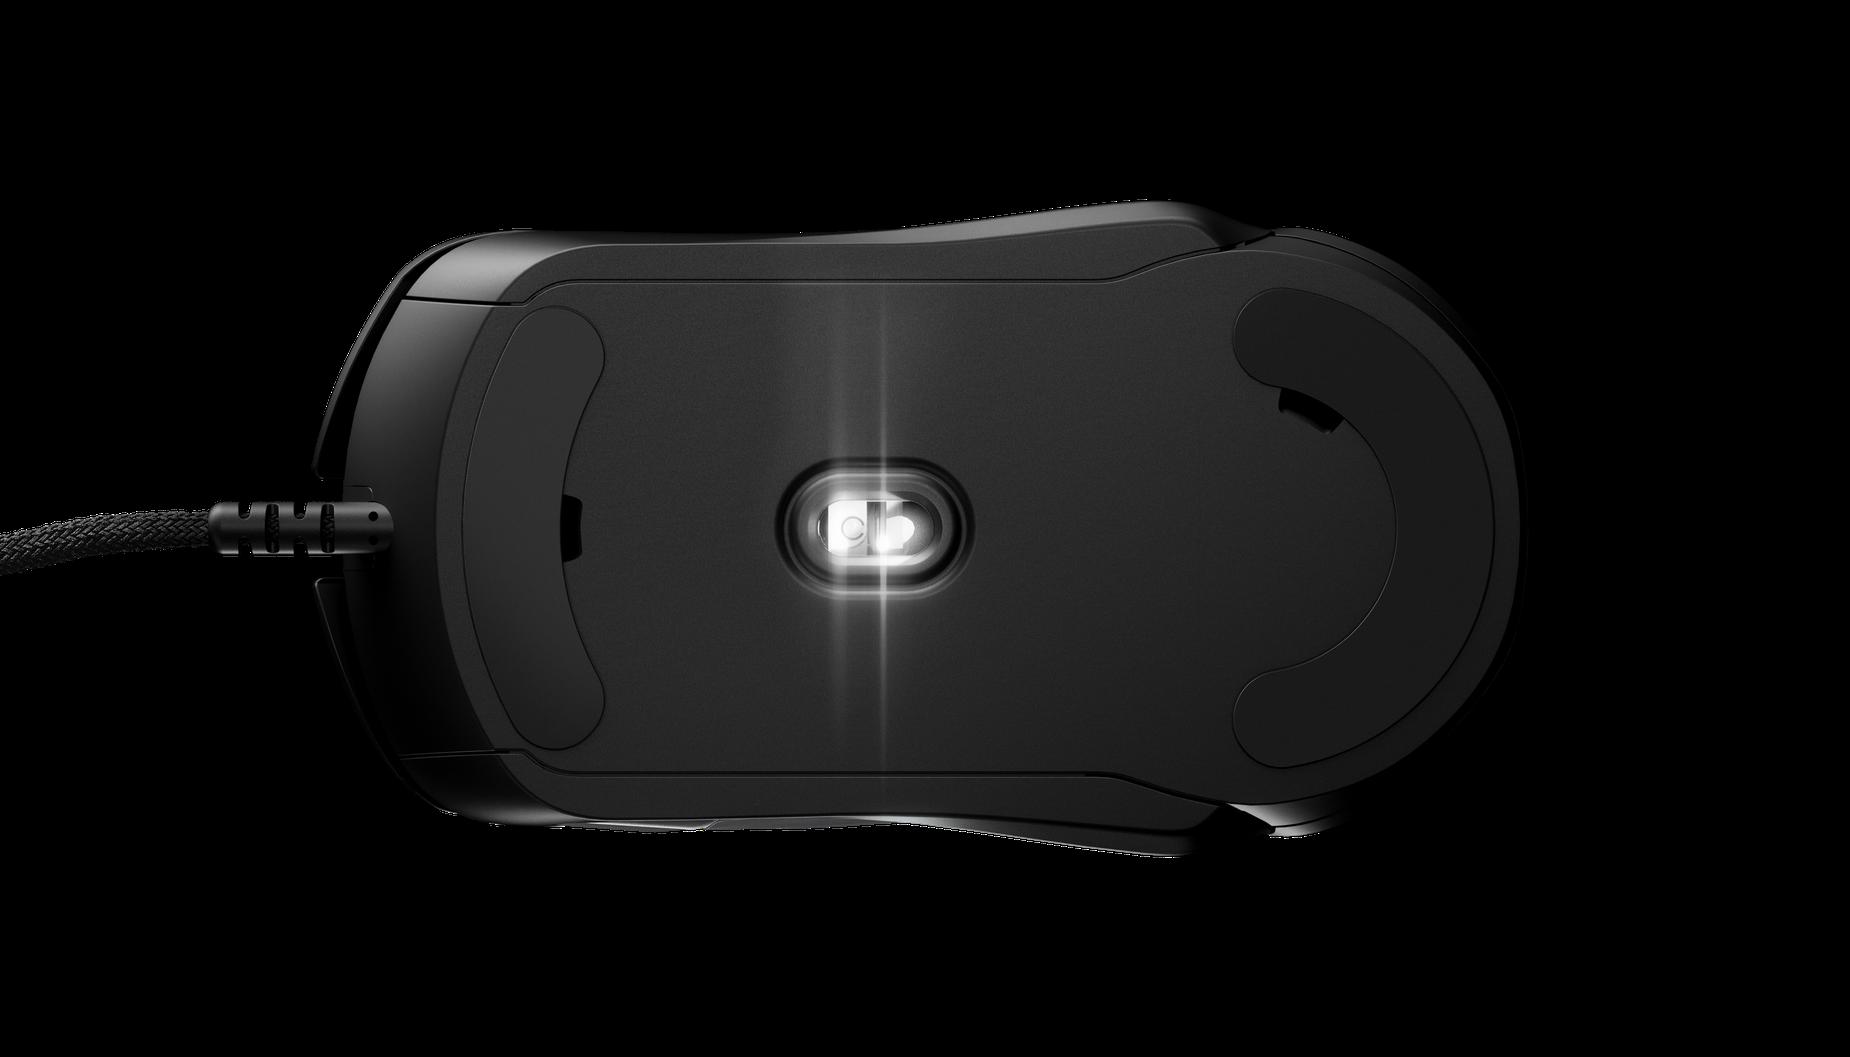 Rival 5 遊戲滑鼠的底部展示滑動滾輪及 TrueMove 感應器。